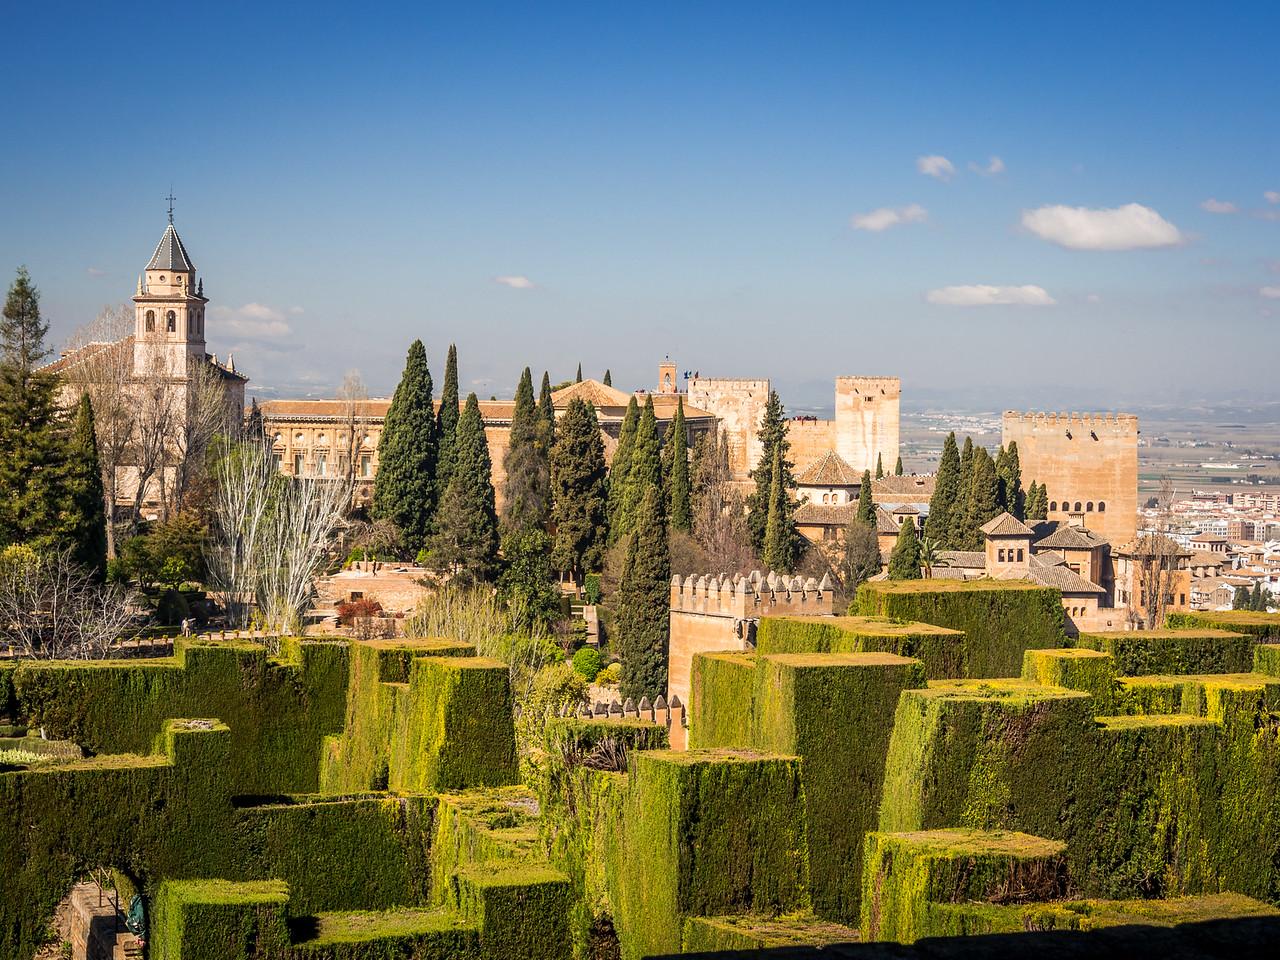 Alhambra from the Generalife, Granada, Spain